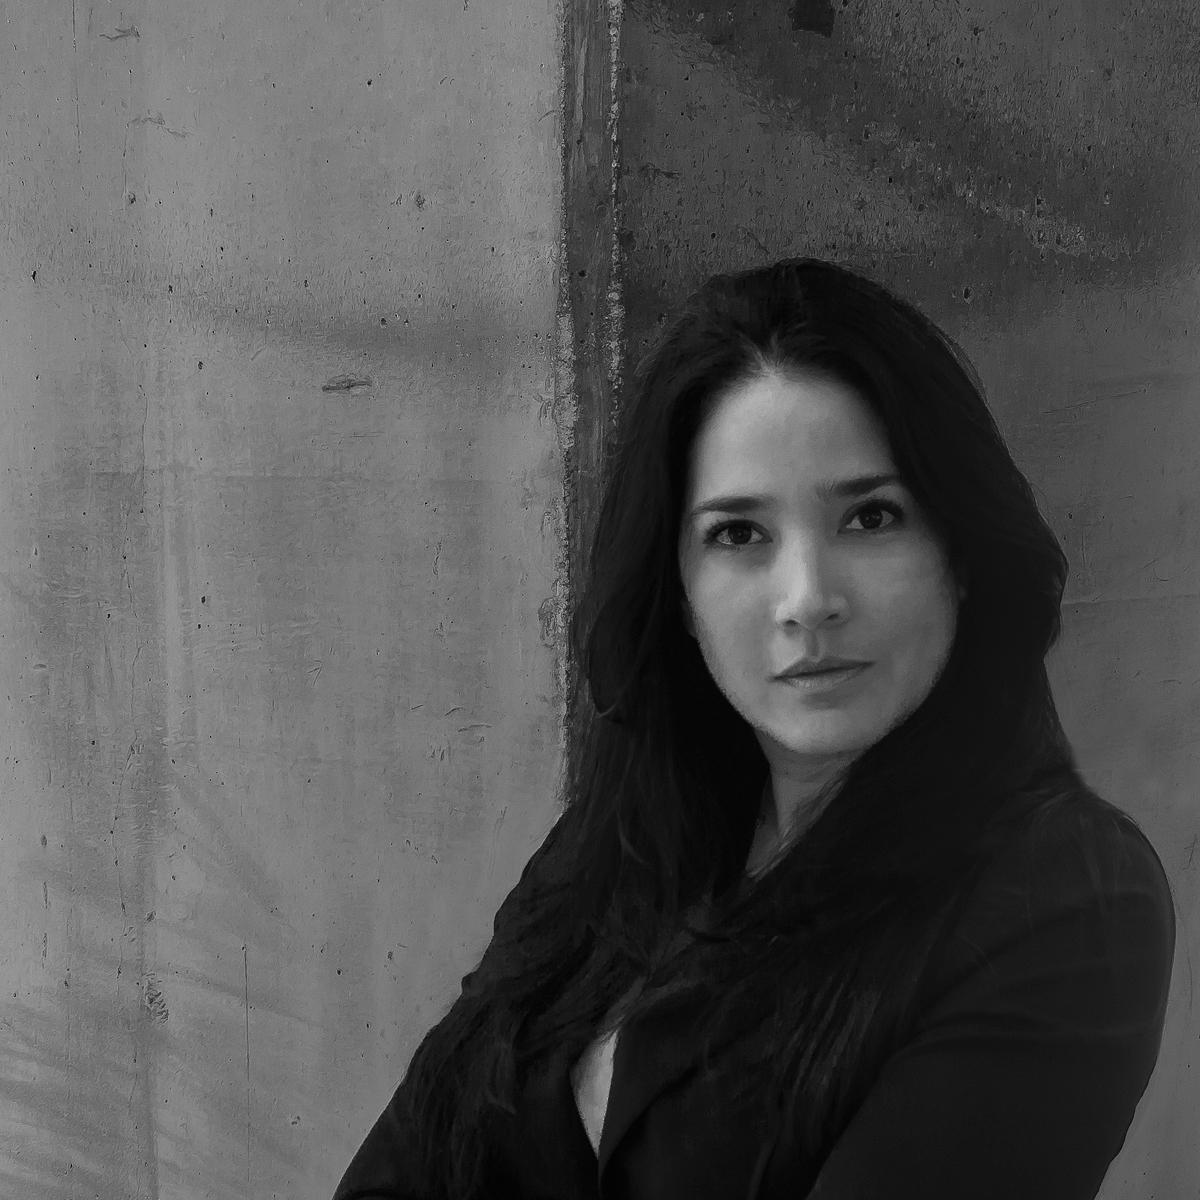 <b>Paola Rengifo</b>#Senior Design Associate#paola@radyca.com